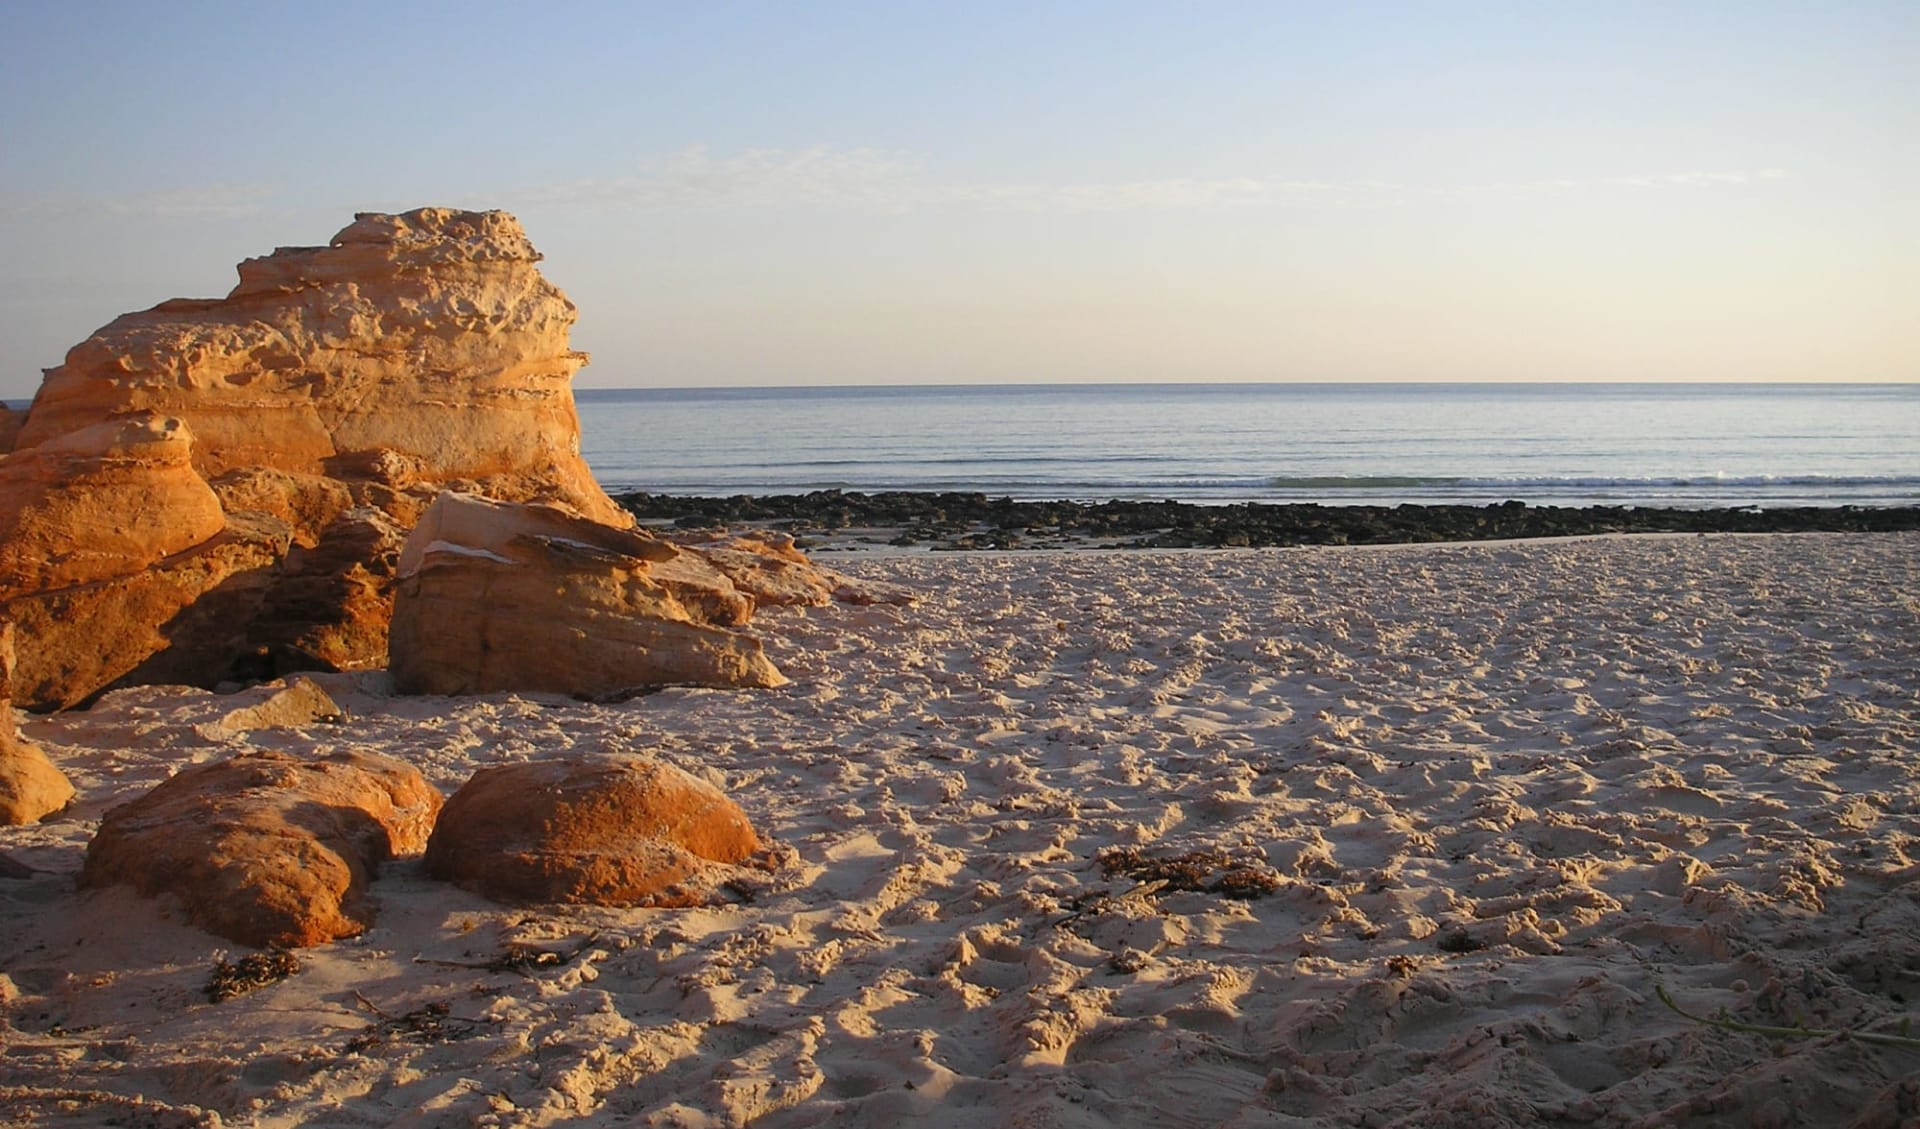 Dampier Peninsula Tour ab Broome: Dampier Peninsula